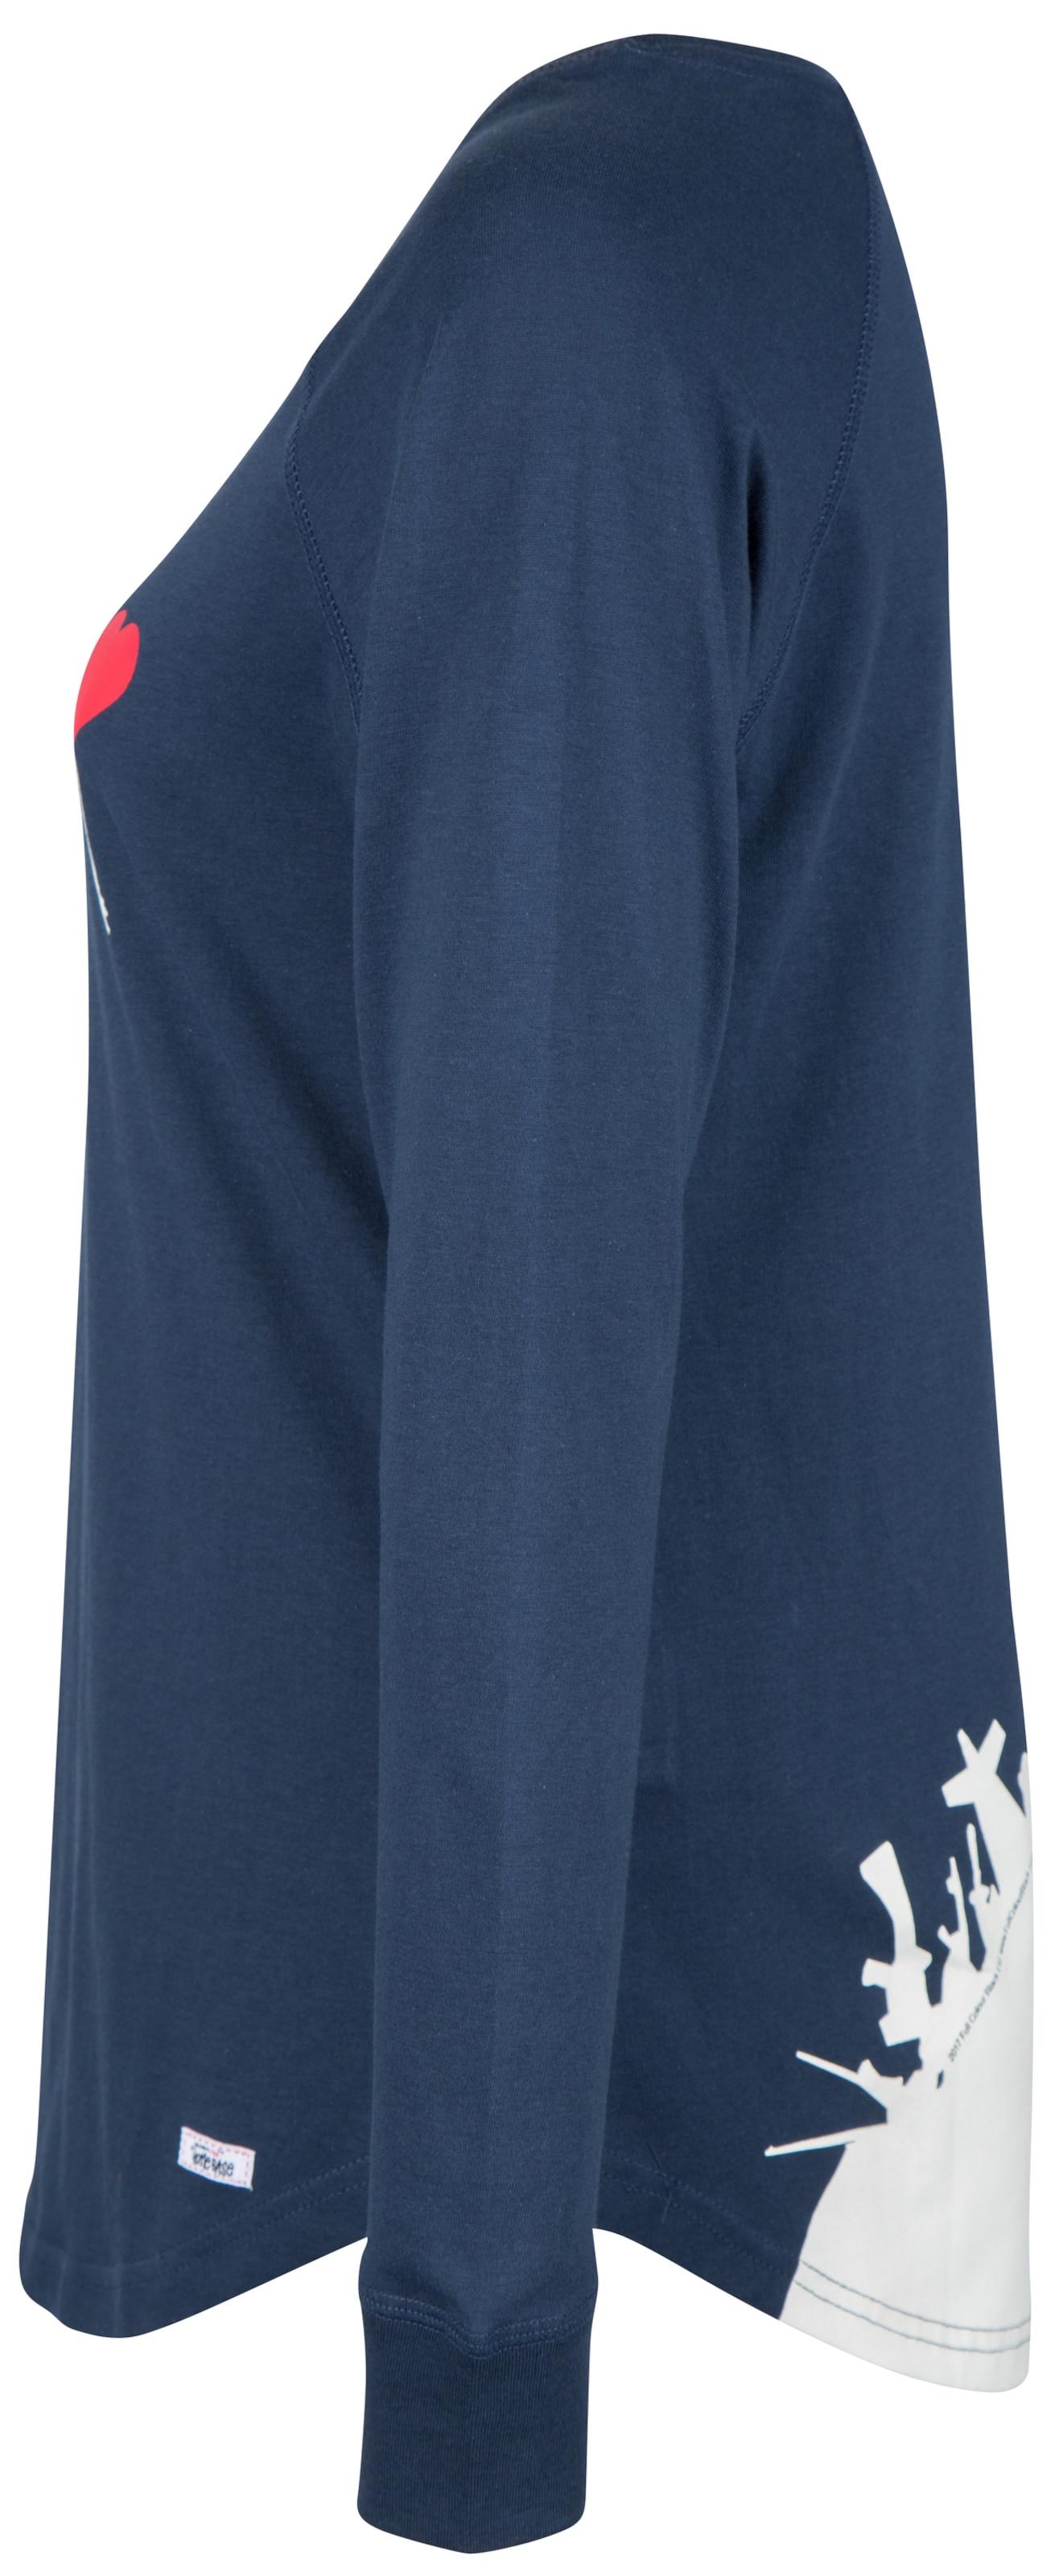 BleuMarine Foncé shirt Homebase By T 'brandalised Homebase' En Ybfg76yv